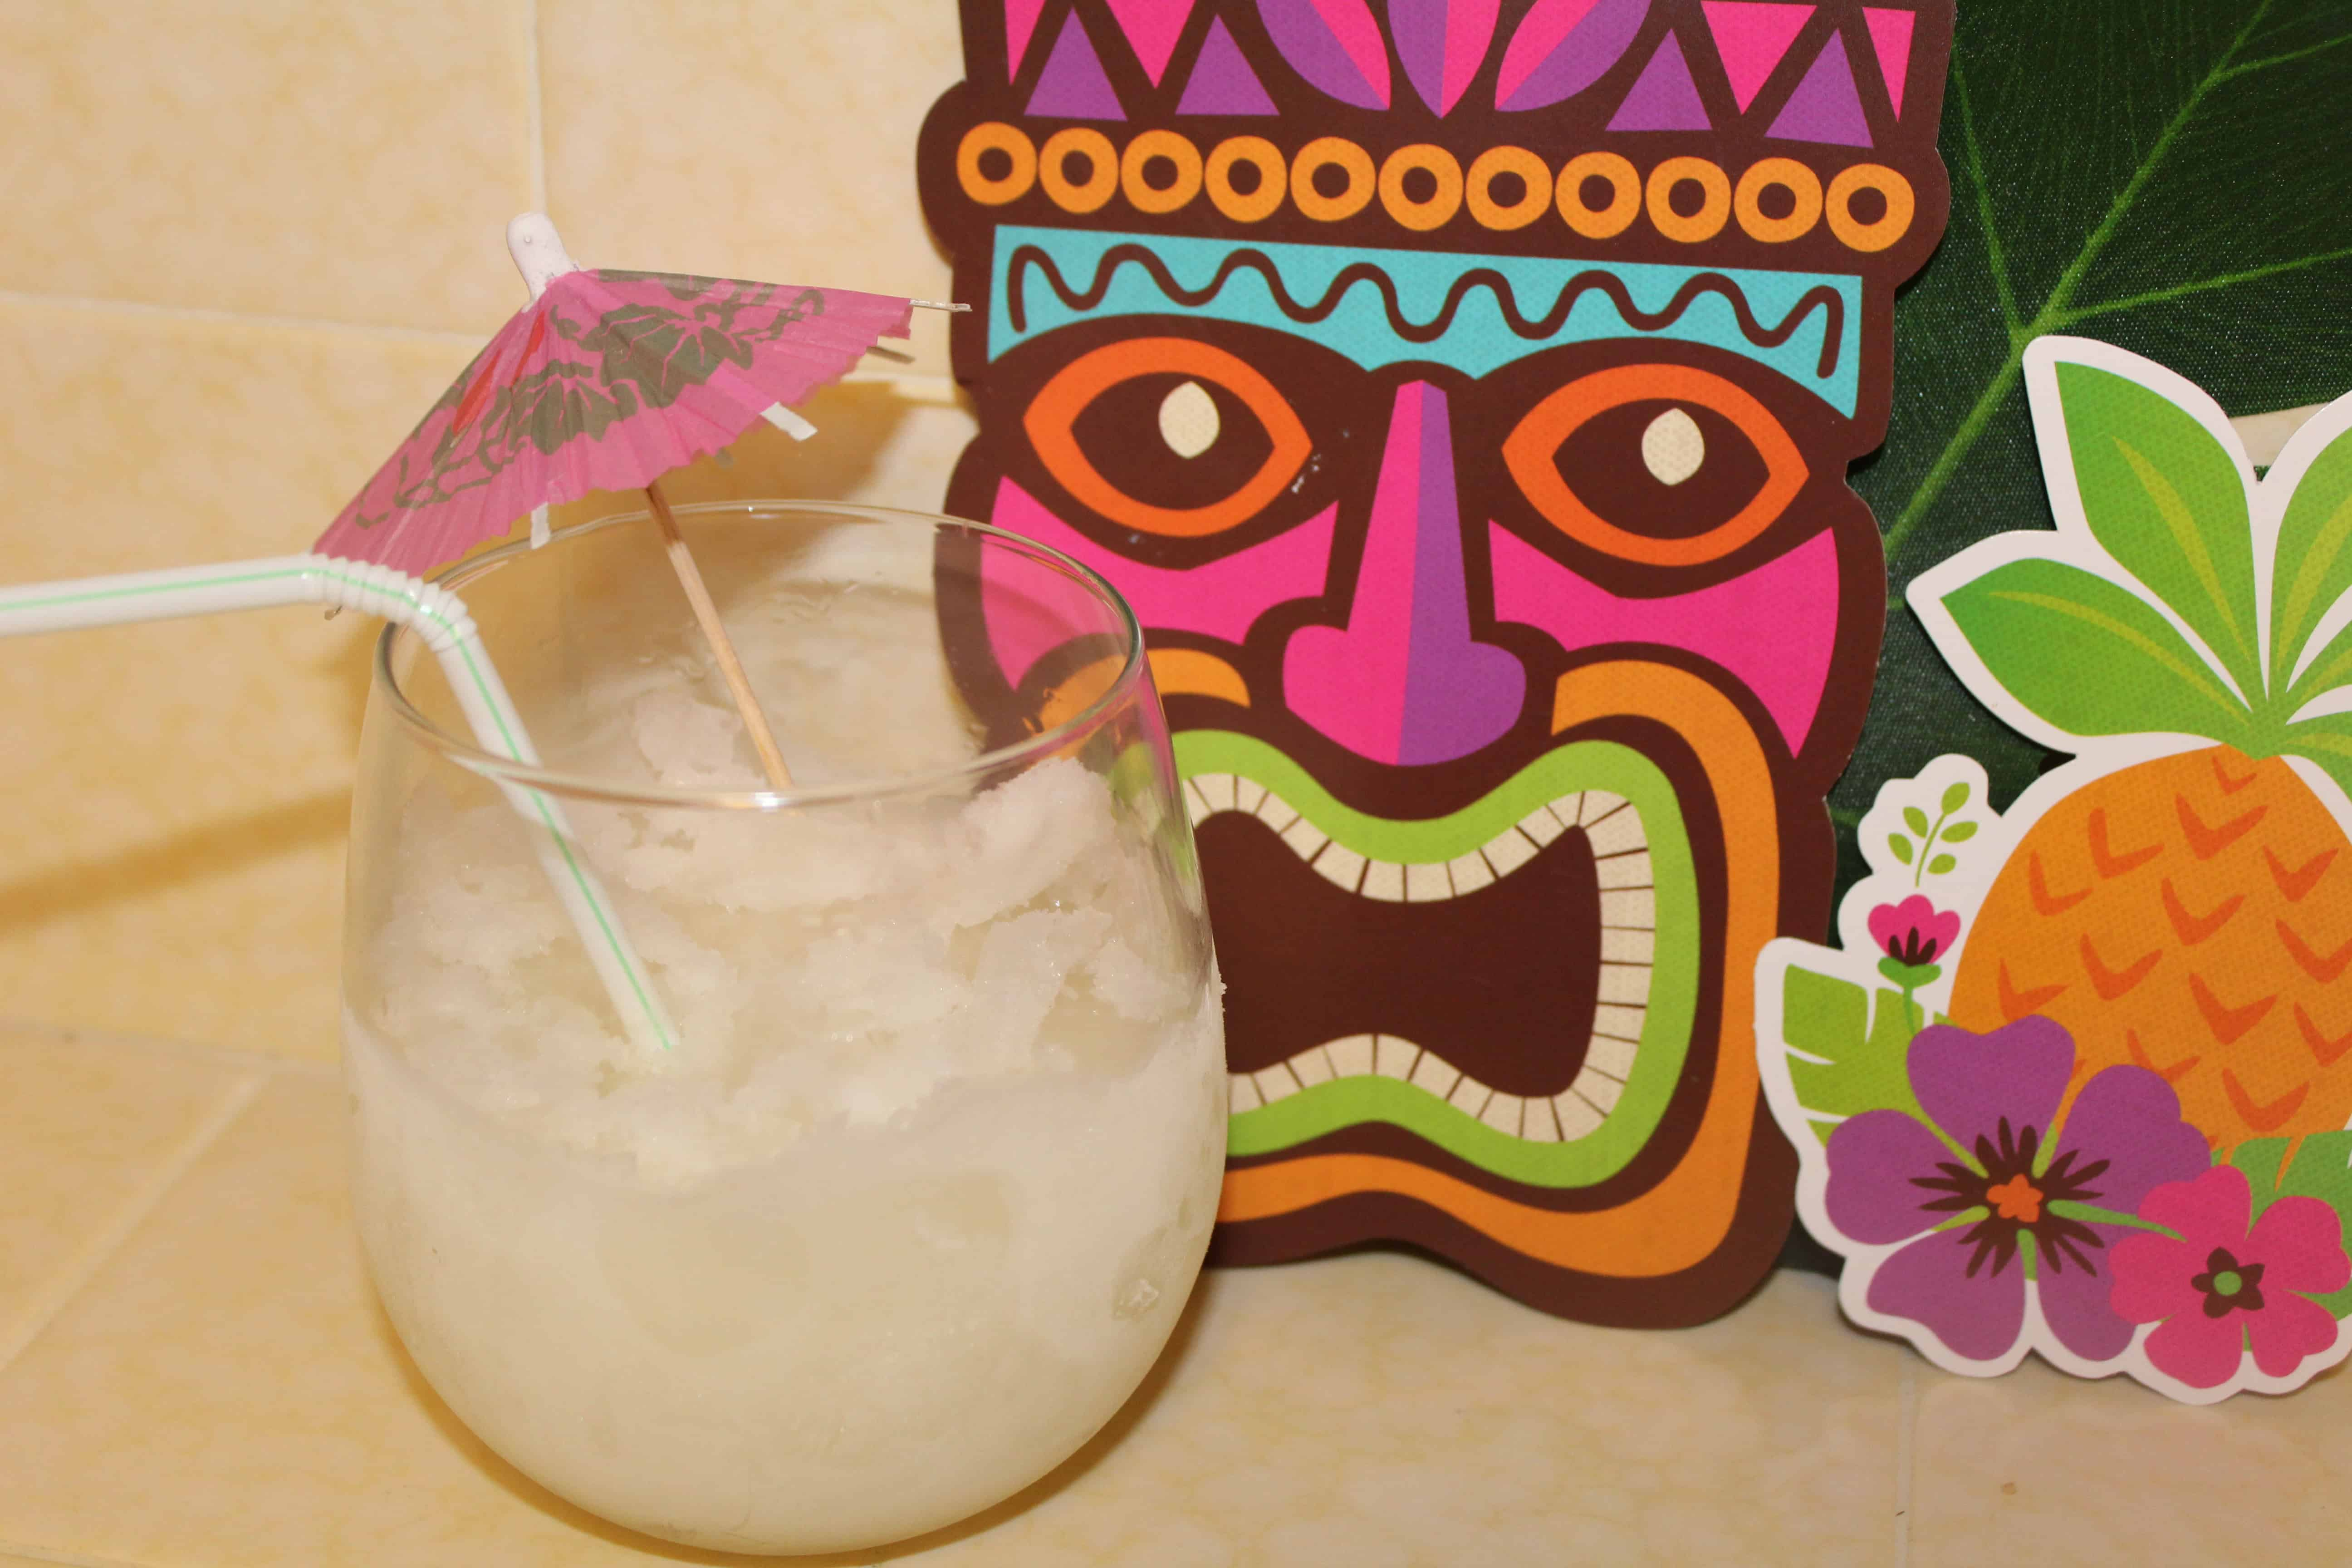 alcoholic lemonade with umbrella